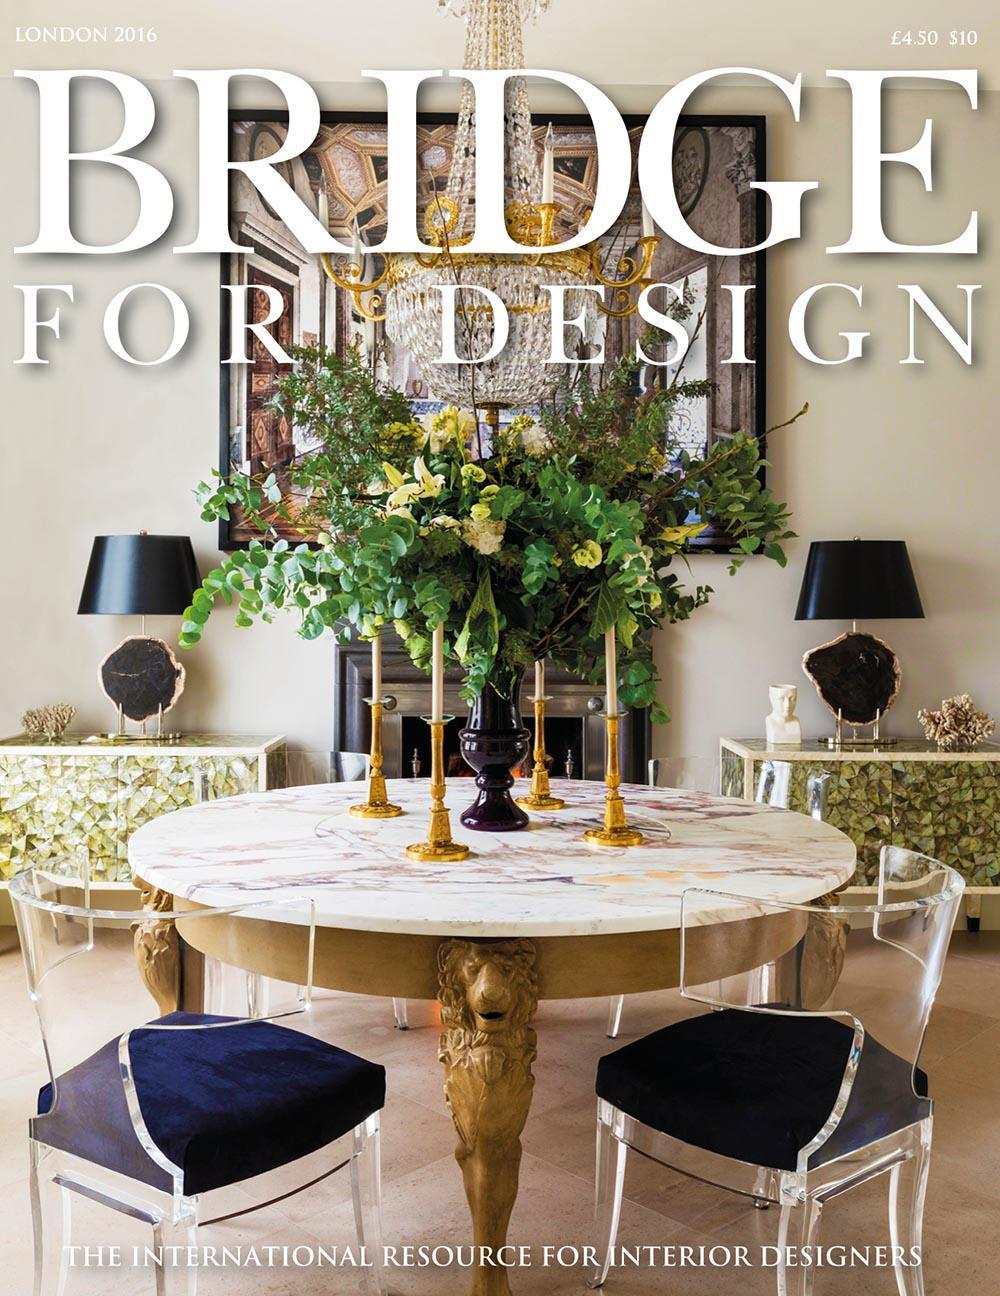 Bridge For Design London 2016